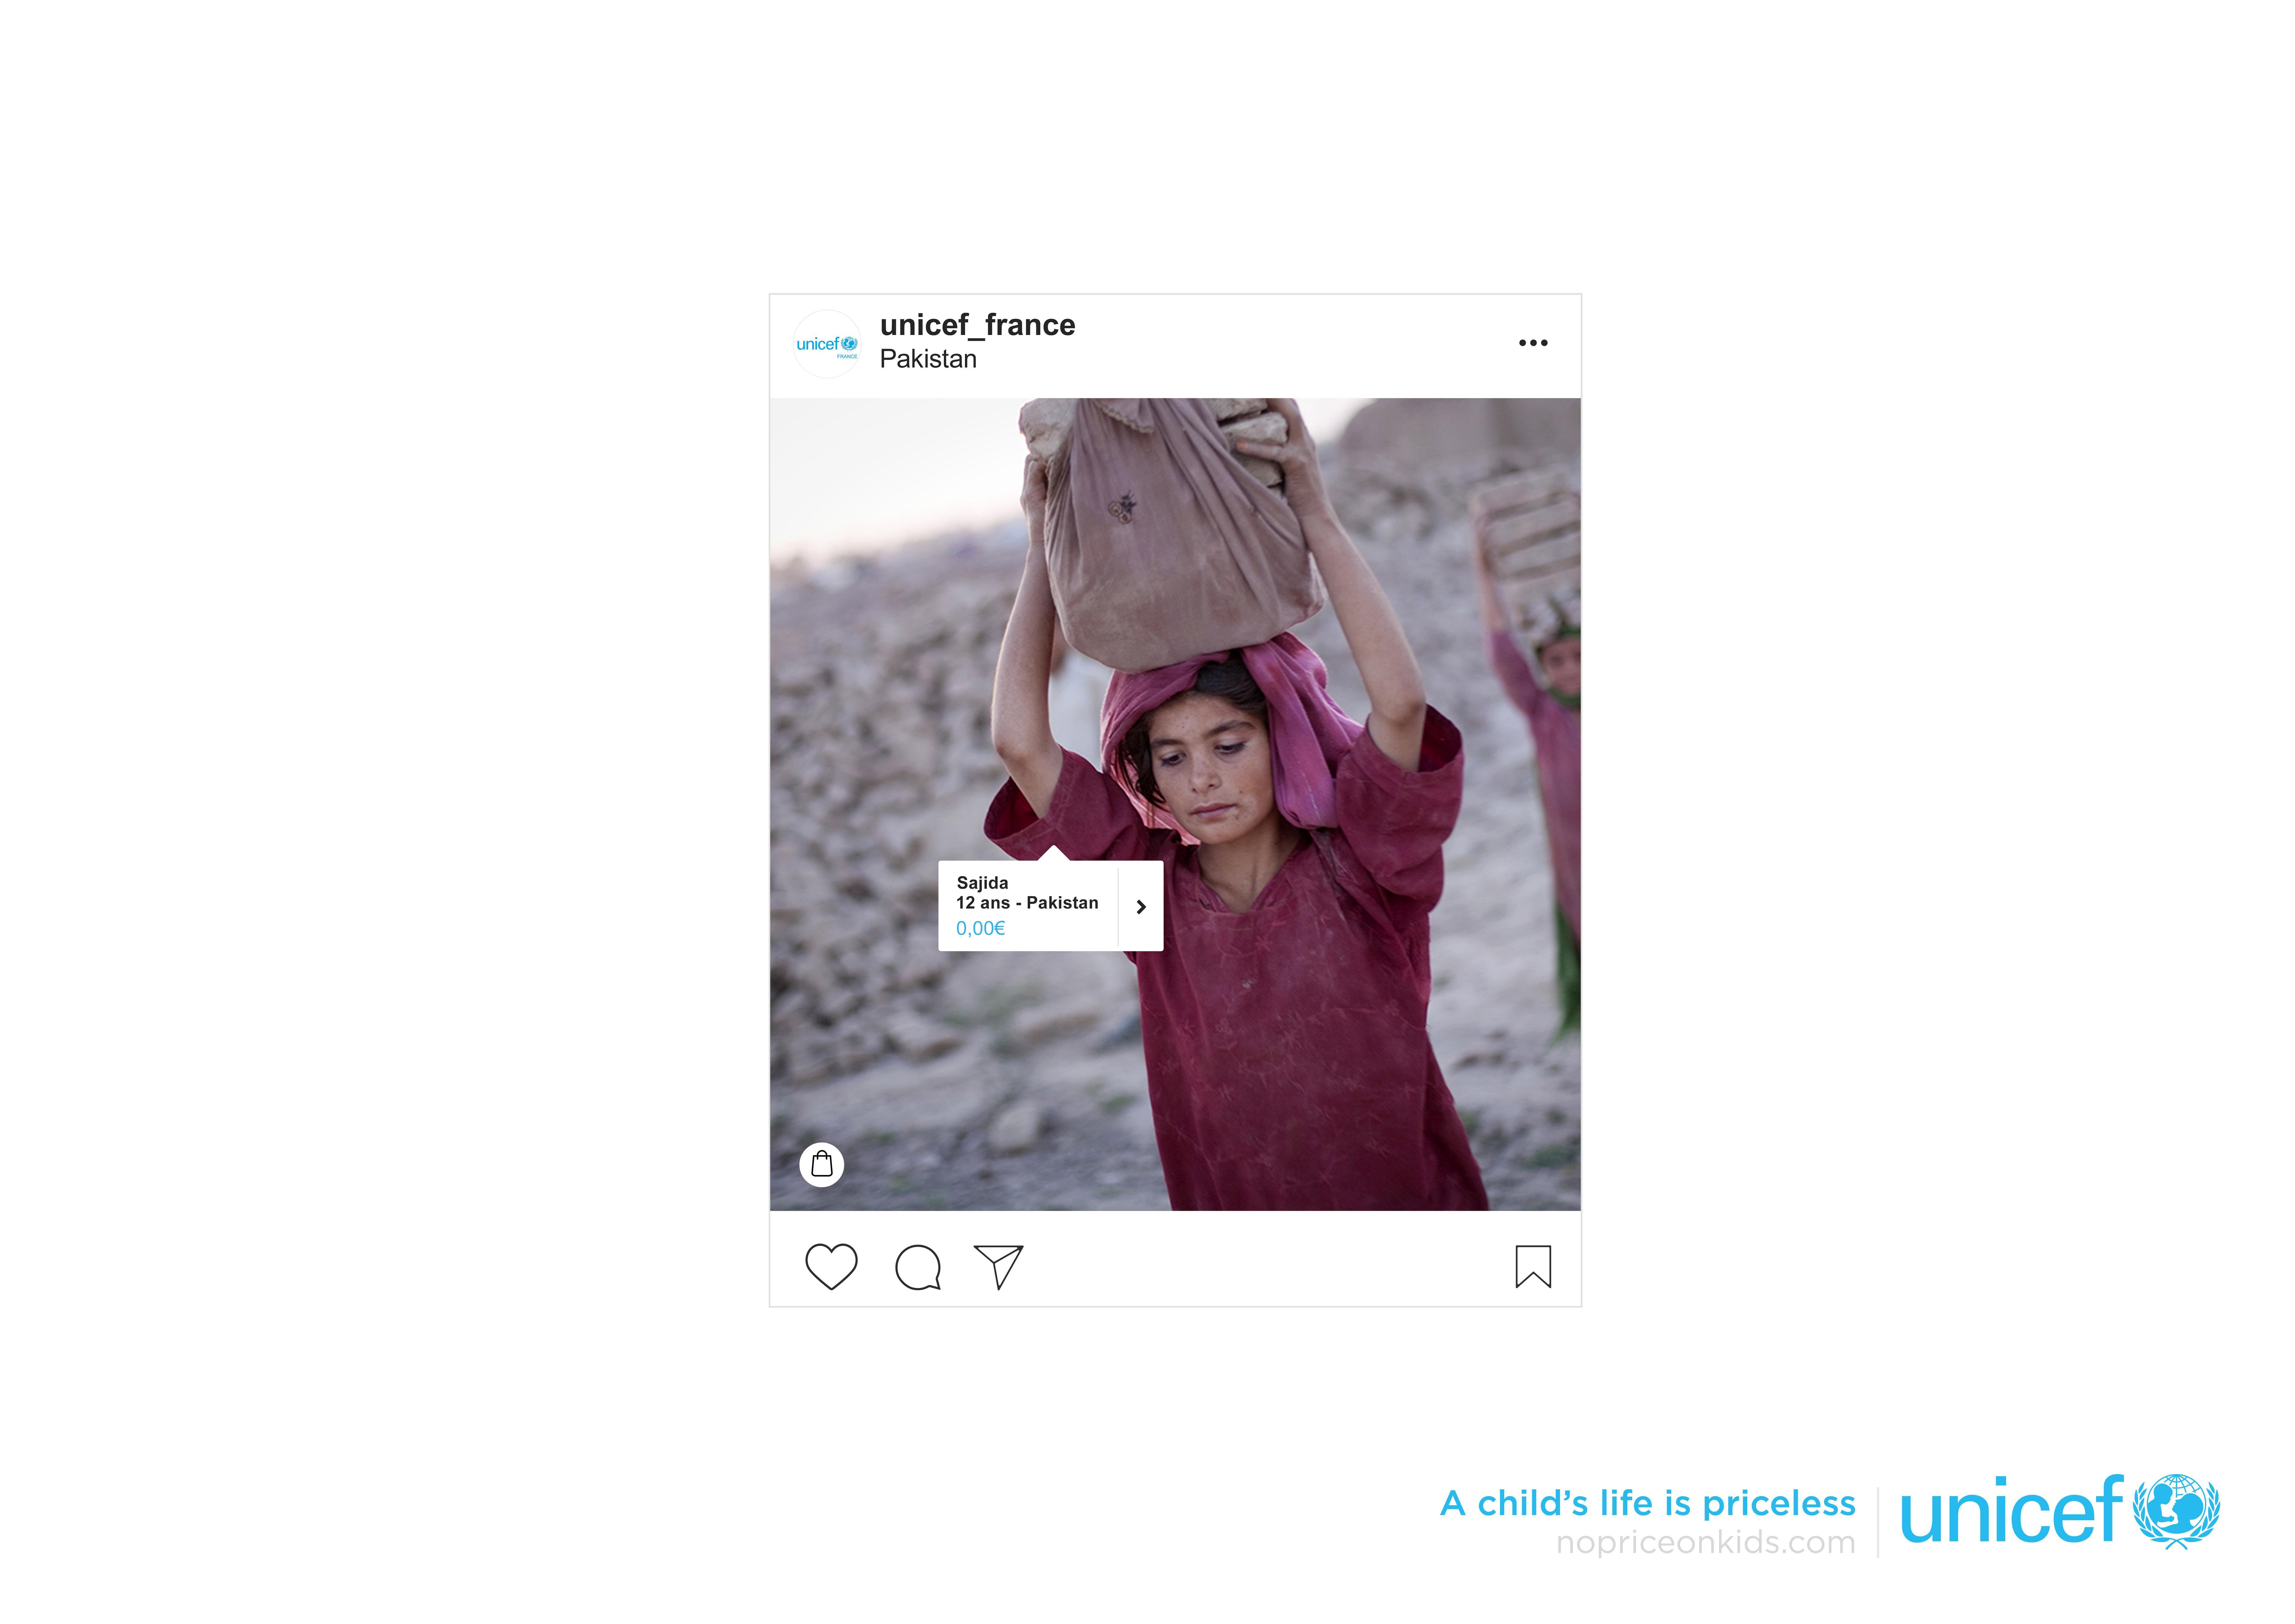 Unicef Digital Ad - #NoPriceOnKids